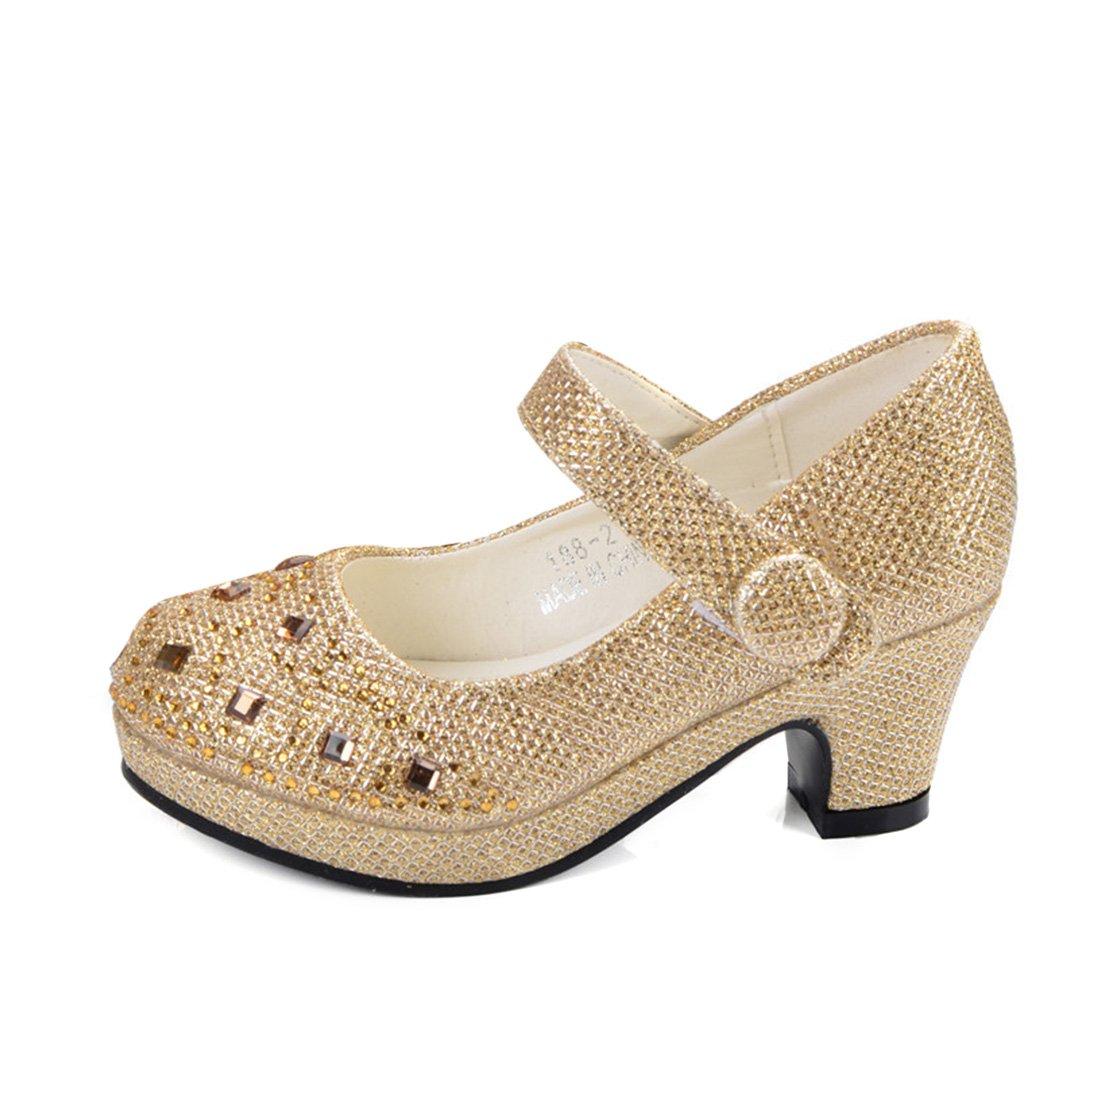 YIBLBOX Girls Kids Toddler Dress up Cosplay Princess Wedding Dance Shoes Crystal Mary Jane Low Heel Shoes by YIBLBOX